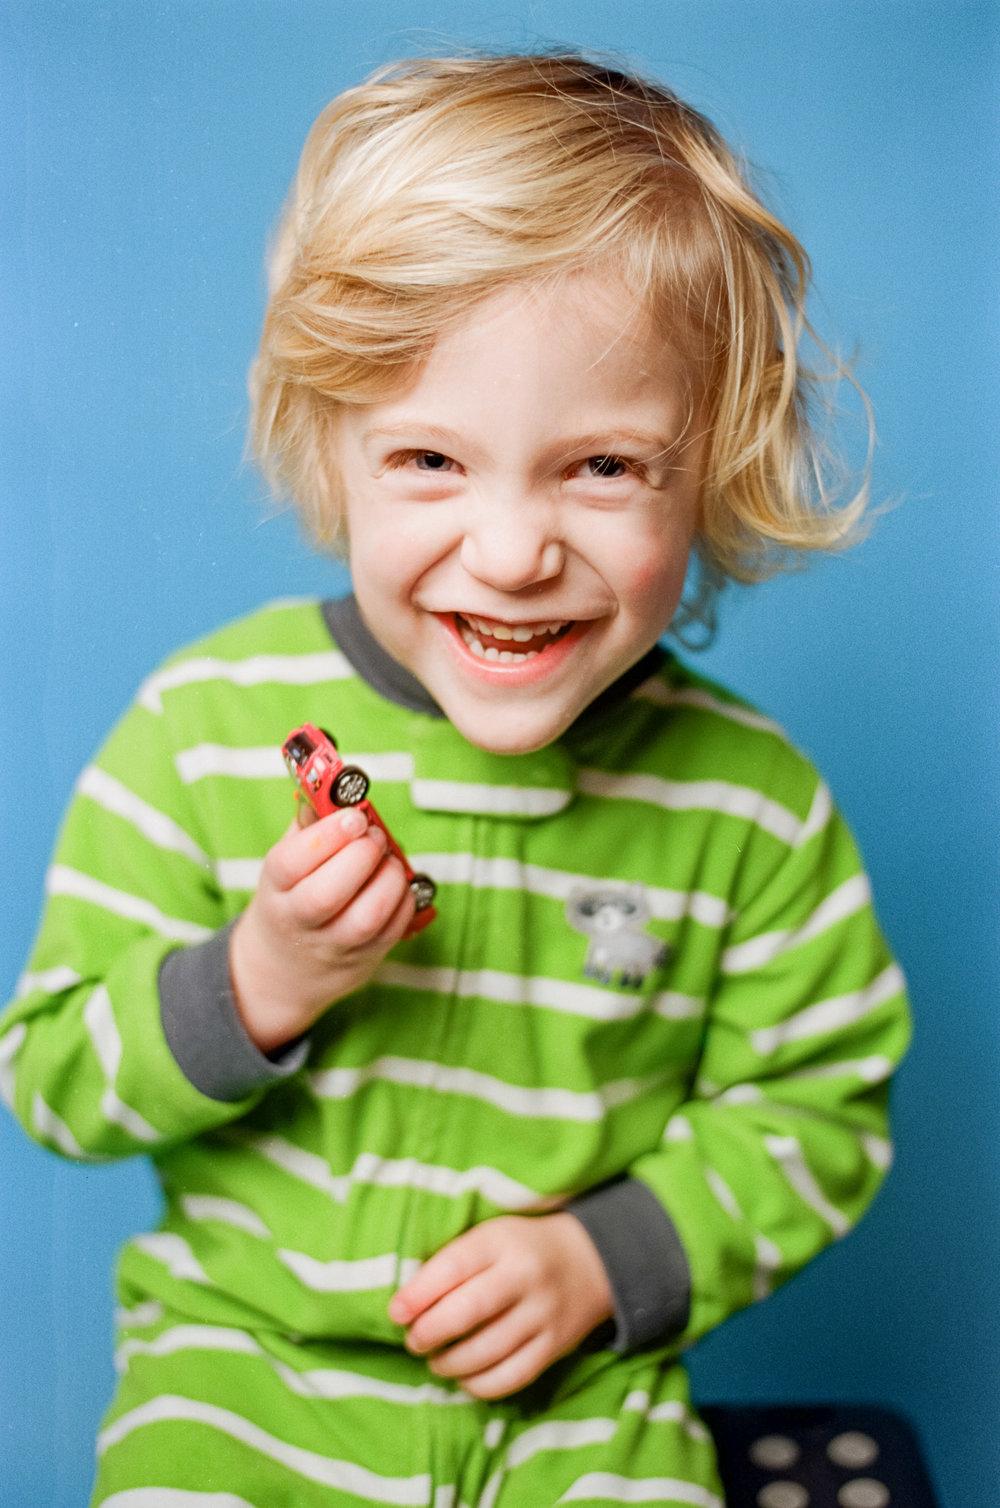 Cute-Kids-Photography-Minneapolis-Film-Photographer-Studio-Flash.jpg